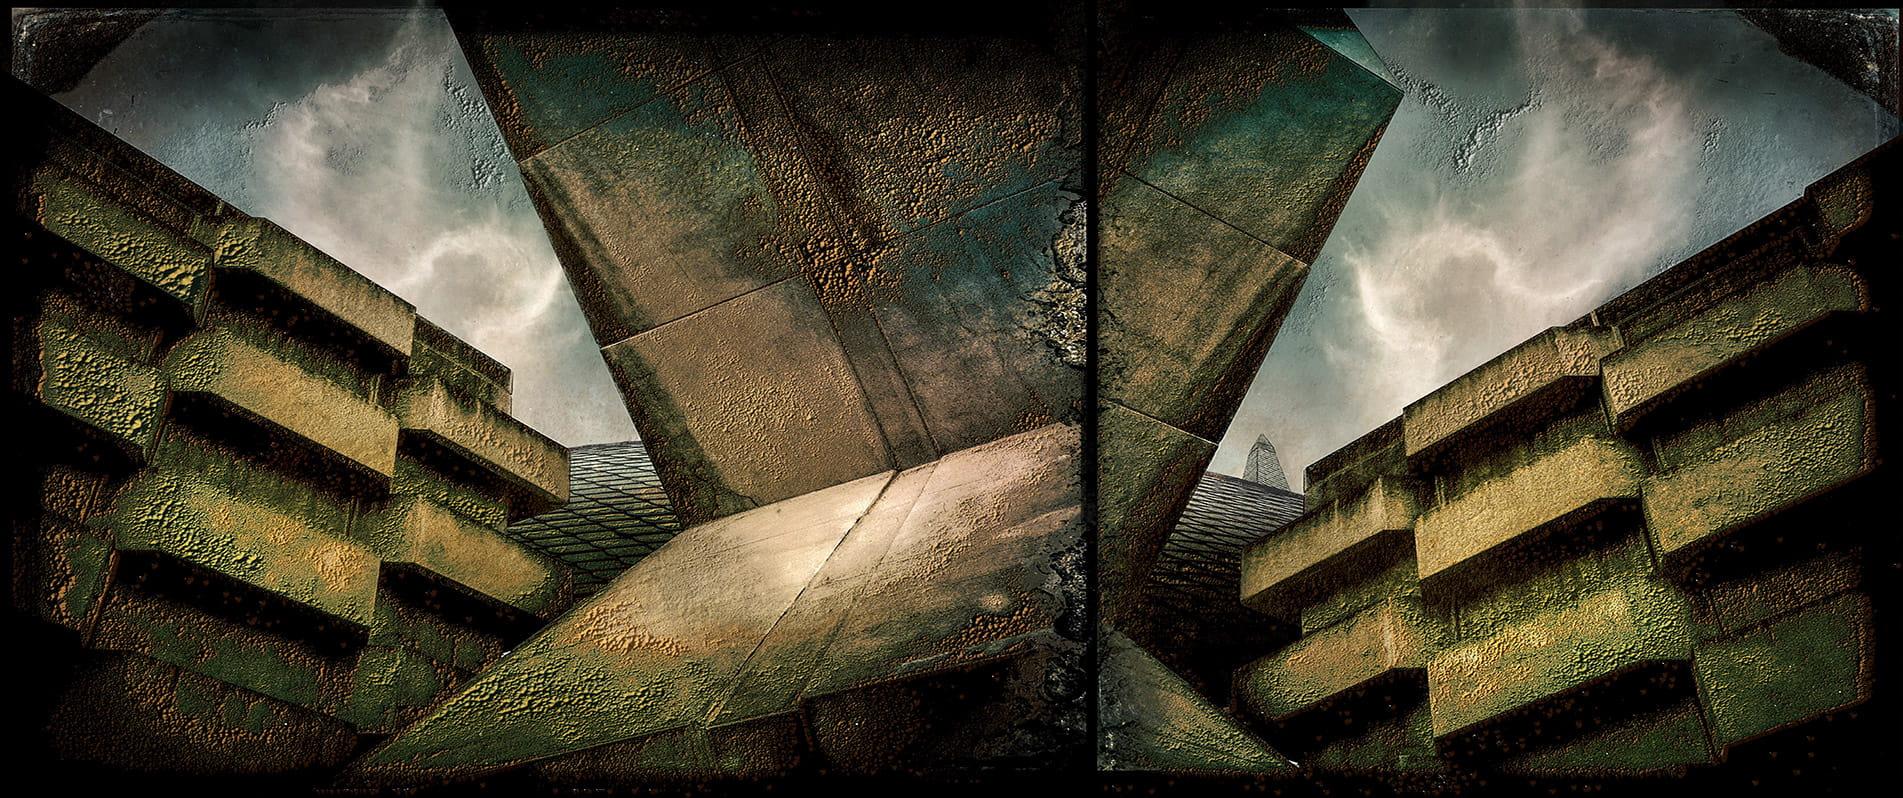 arqeon-torres-tabanera-1903x798